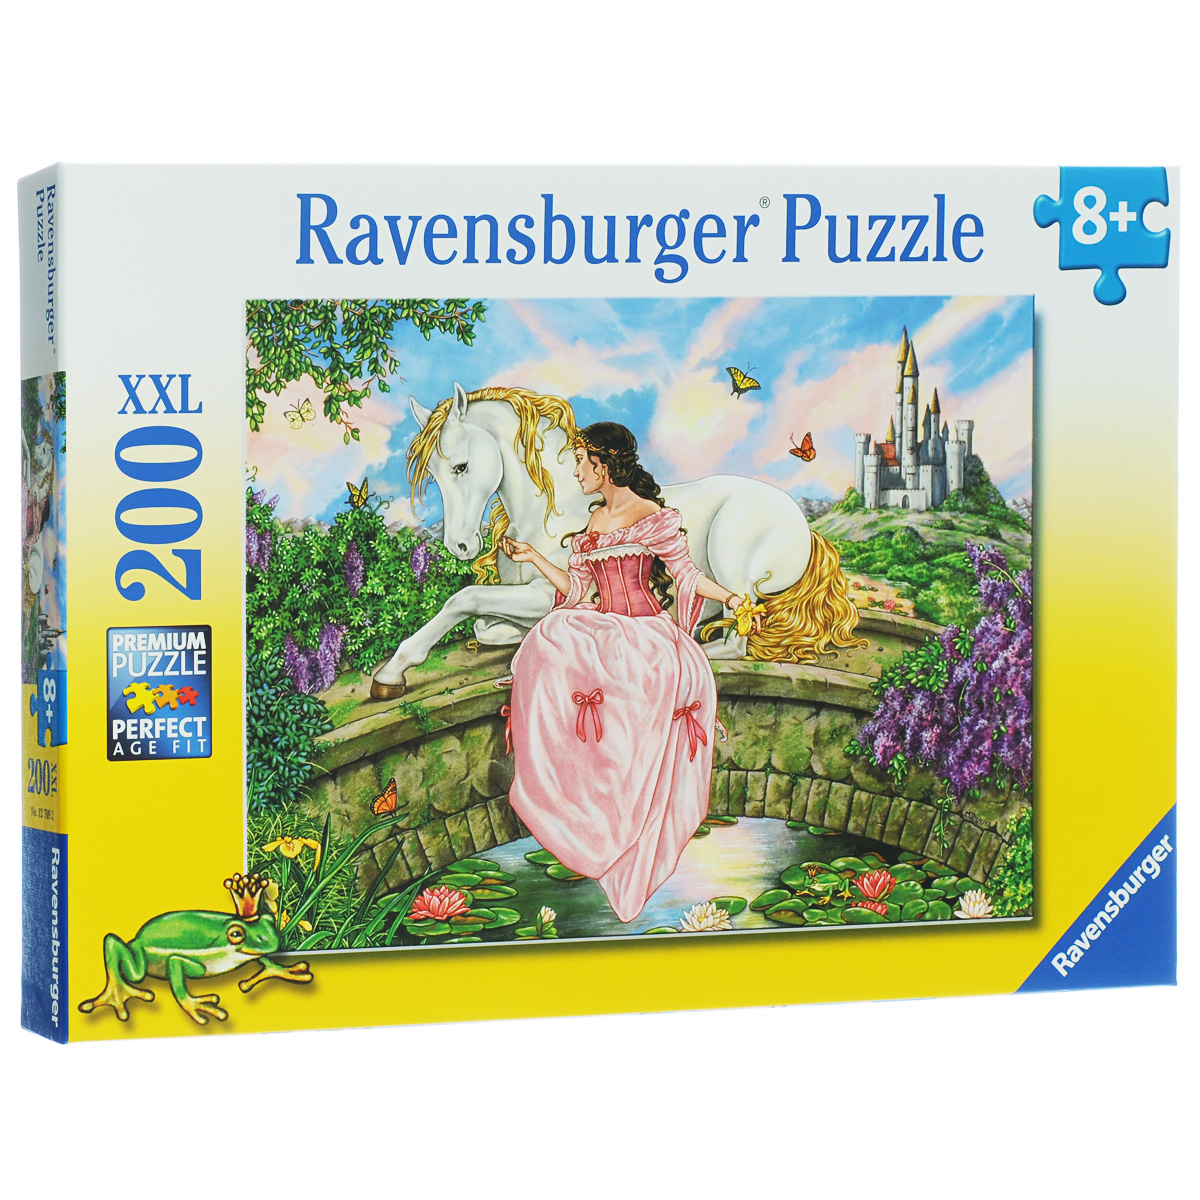 Ravensburger Принцесса на пруду. Пазл XXL, 200 элементов